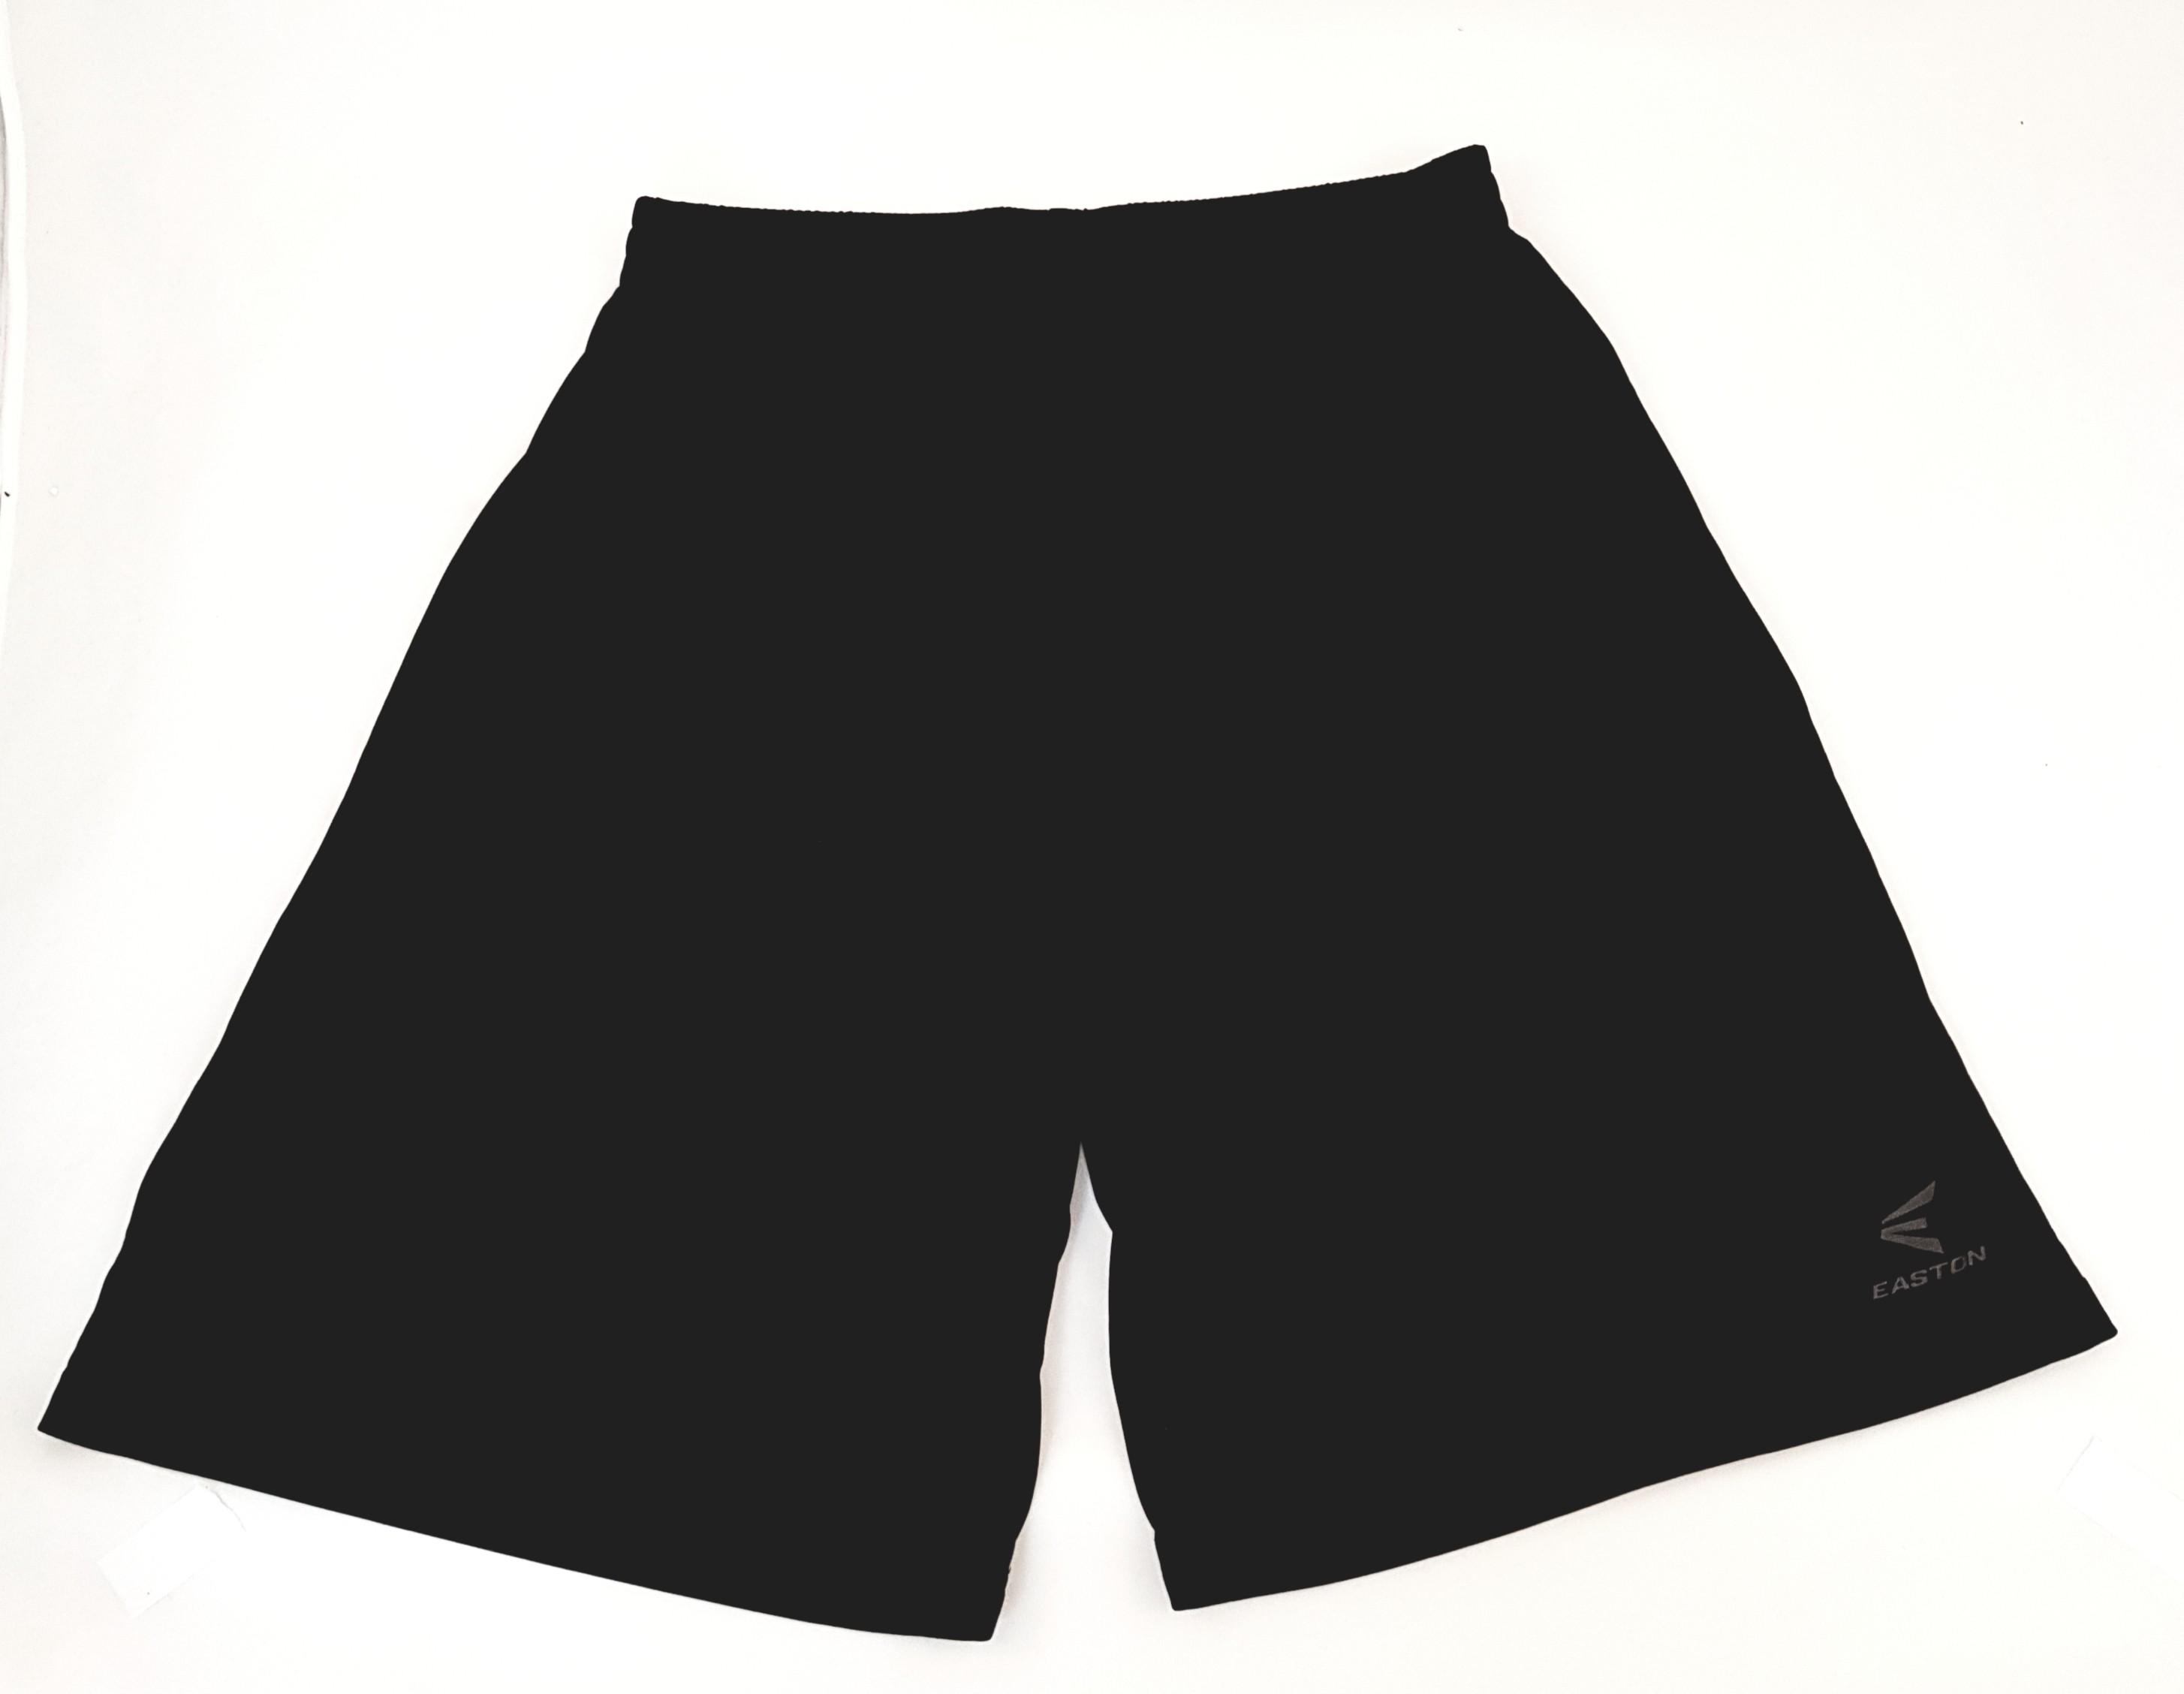 Easton Spirits Screamine Adult Shorts